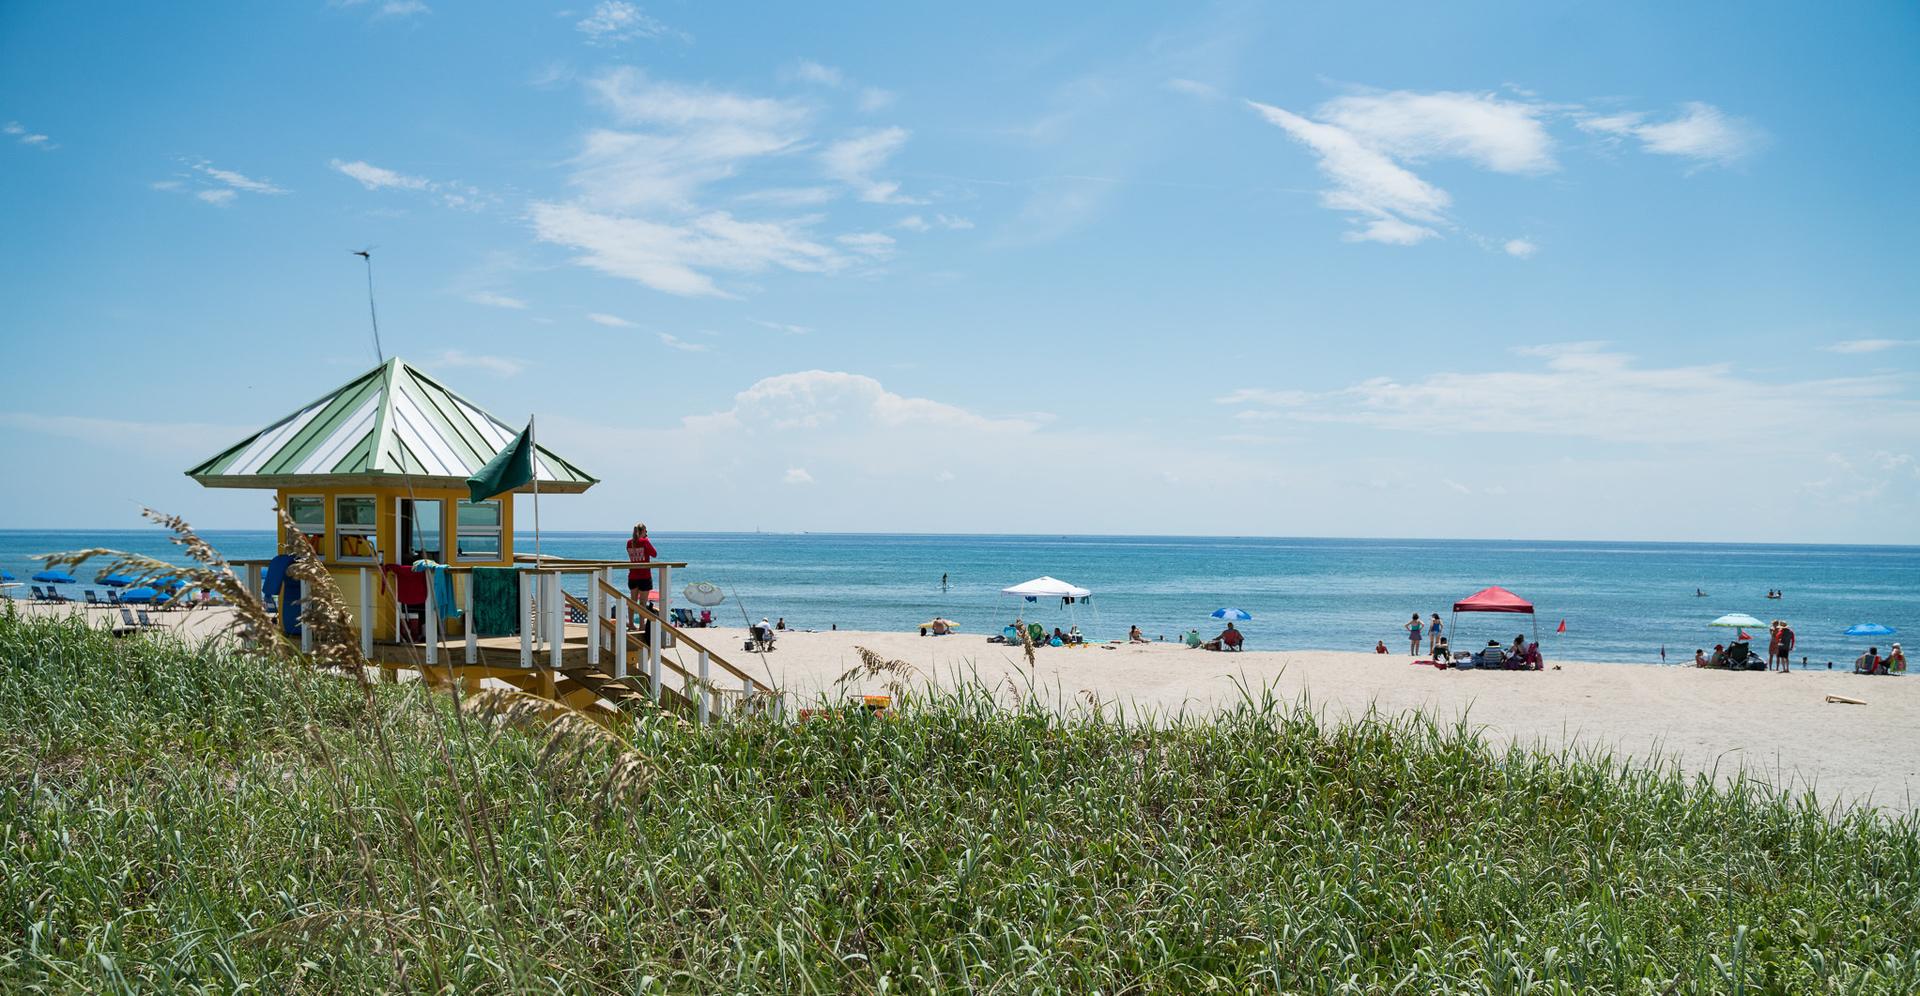 City Of Delray Beach Fl Home